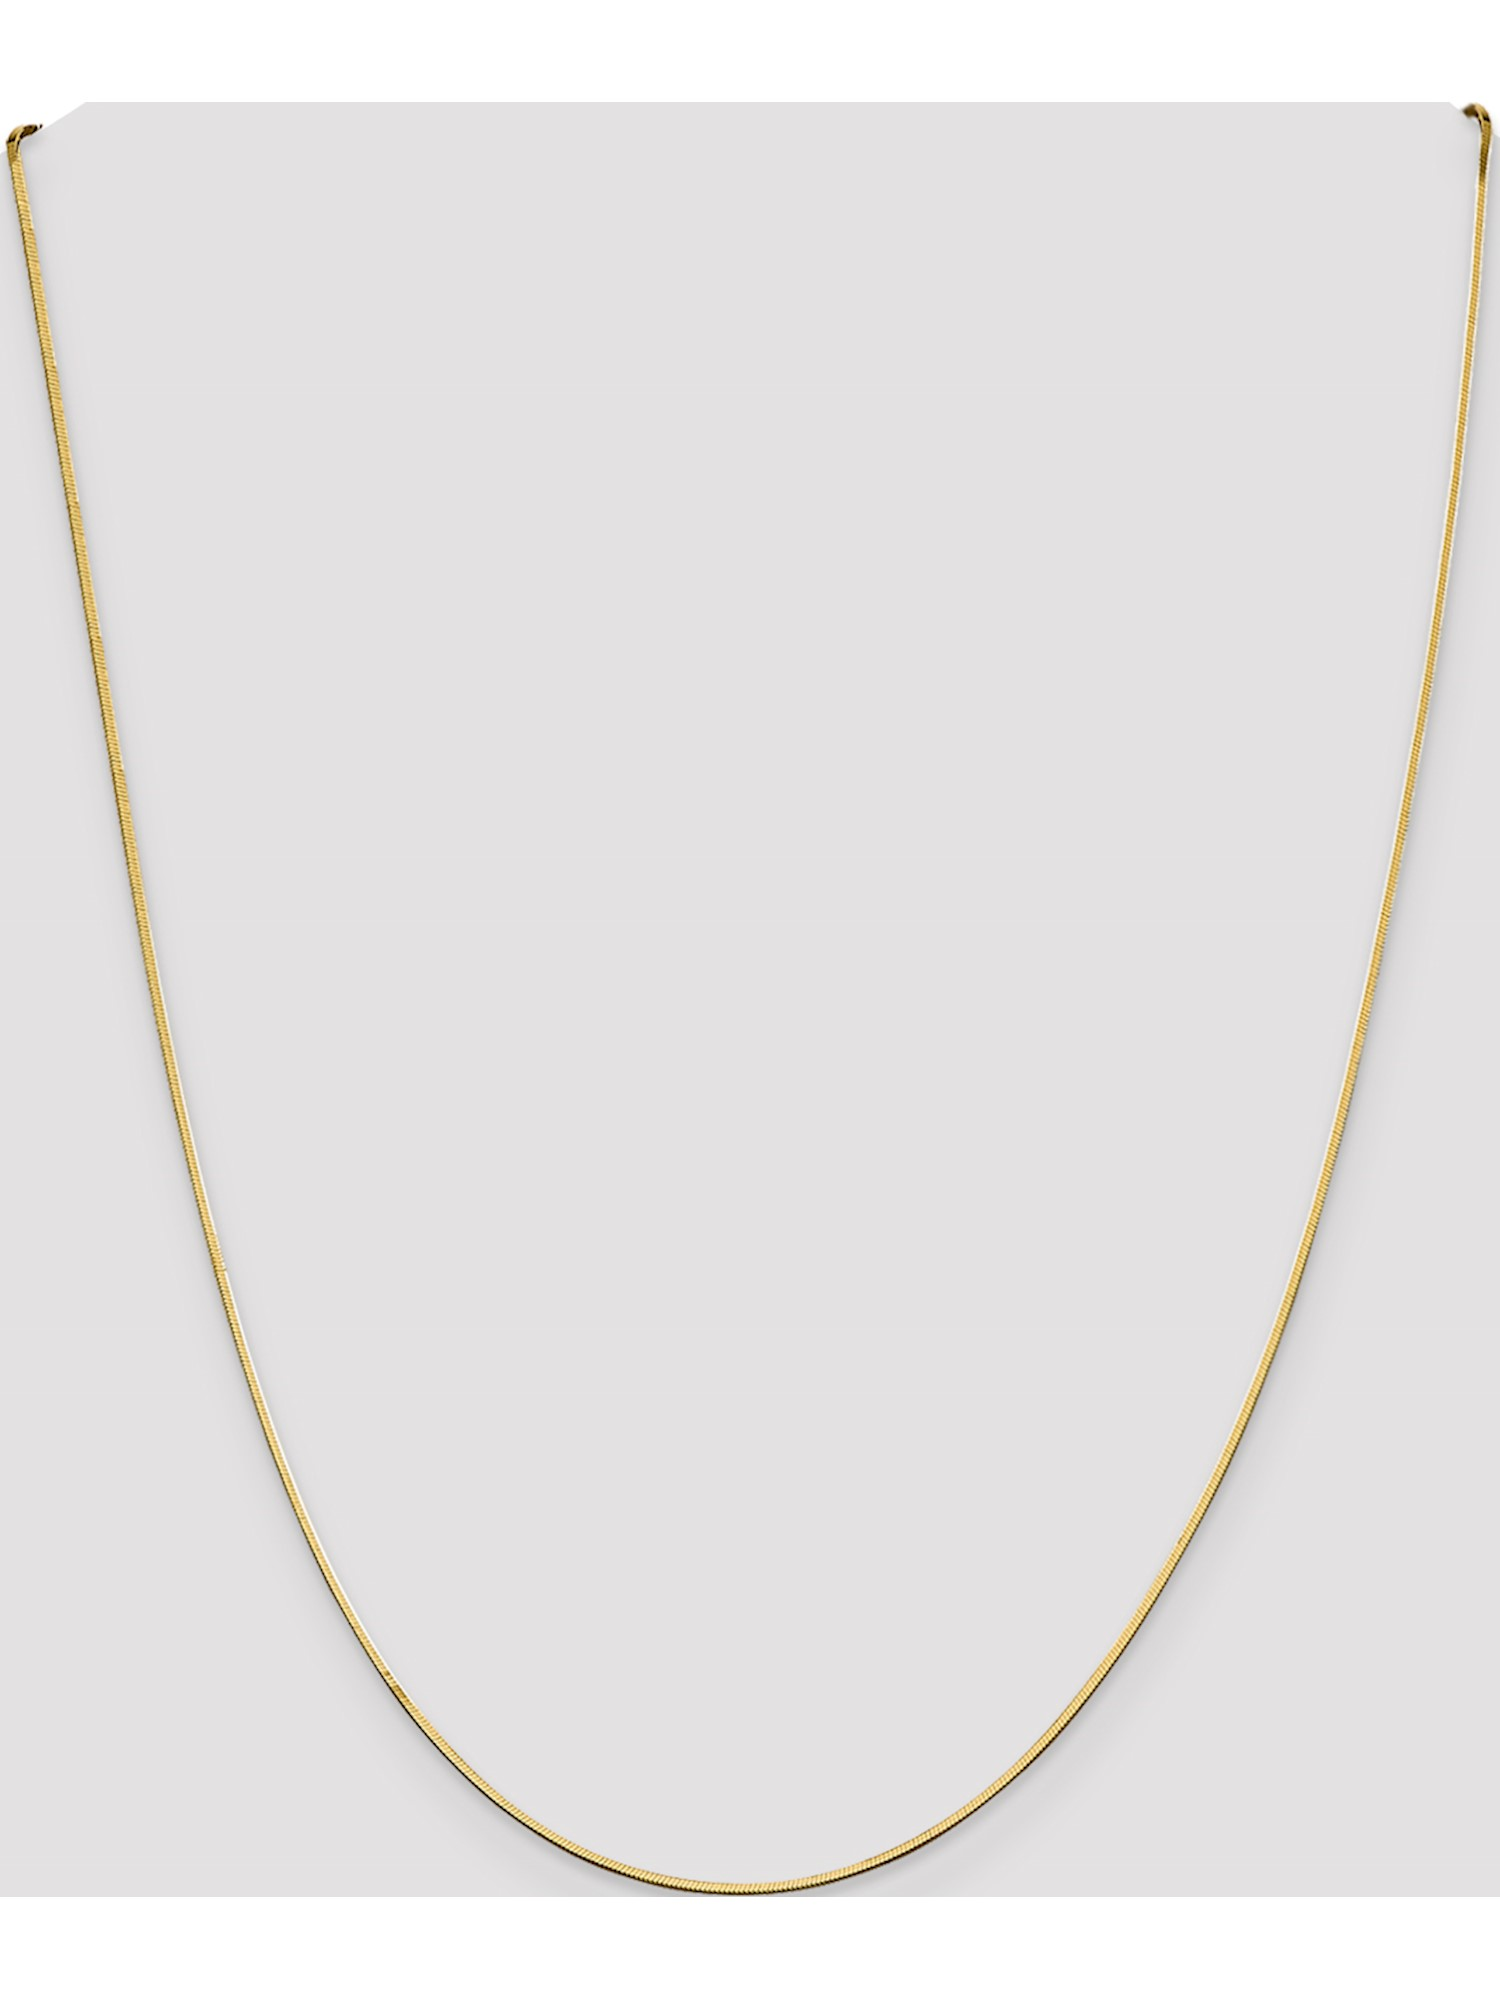 110 cm Leather belt Azzaronavy black . 1.18 43.31 30 mm